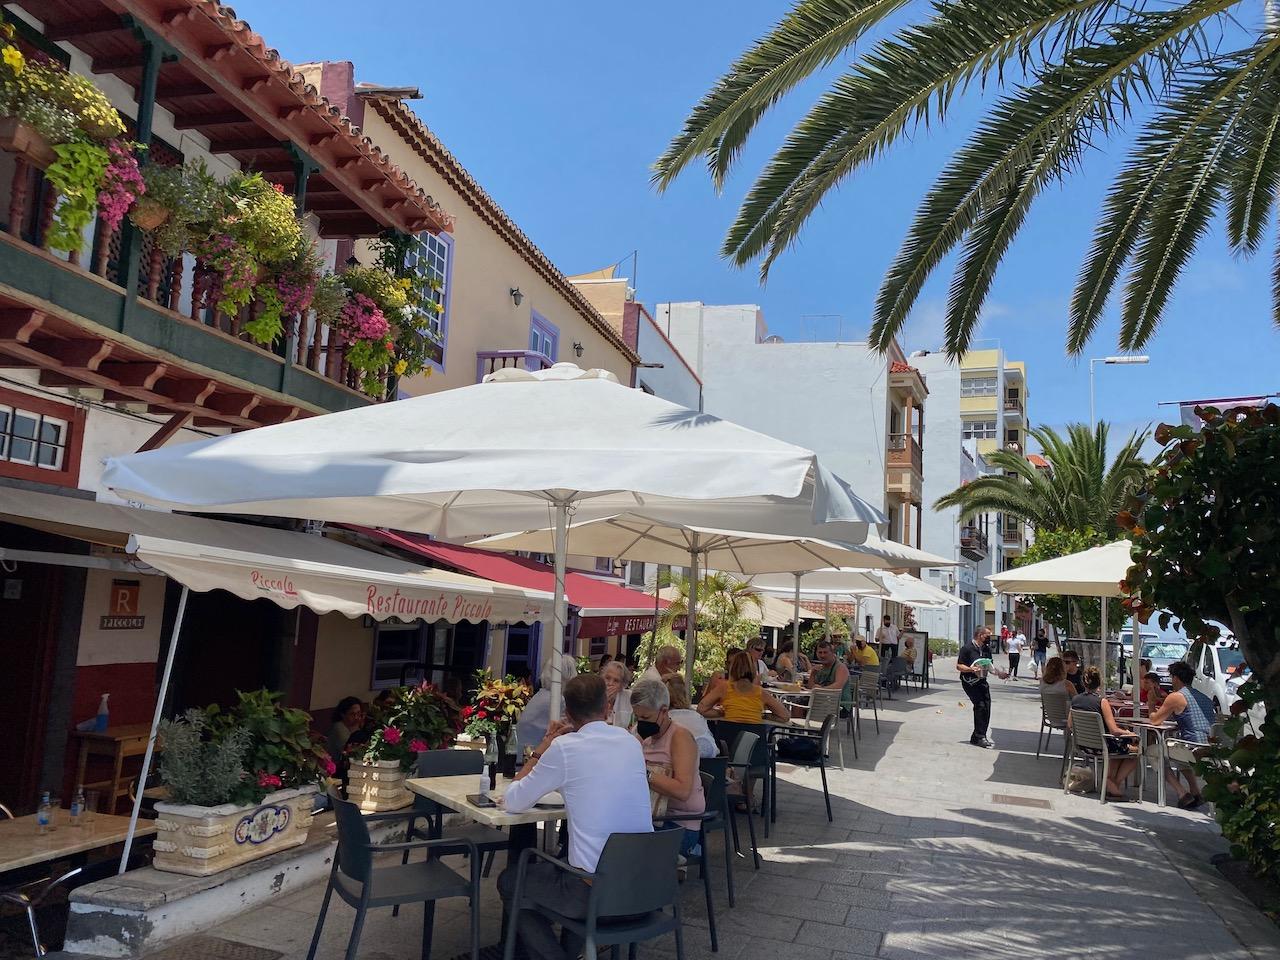 Balcony restaurants